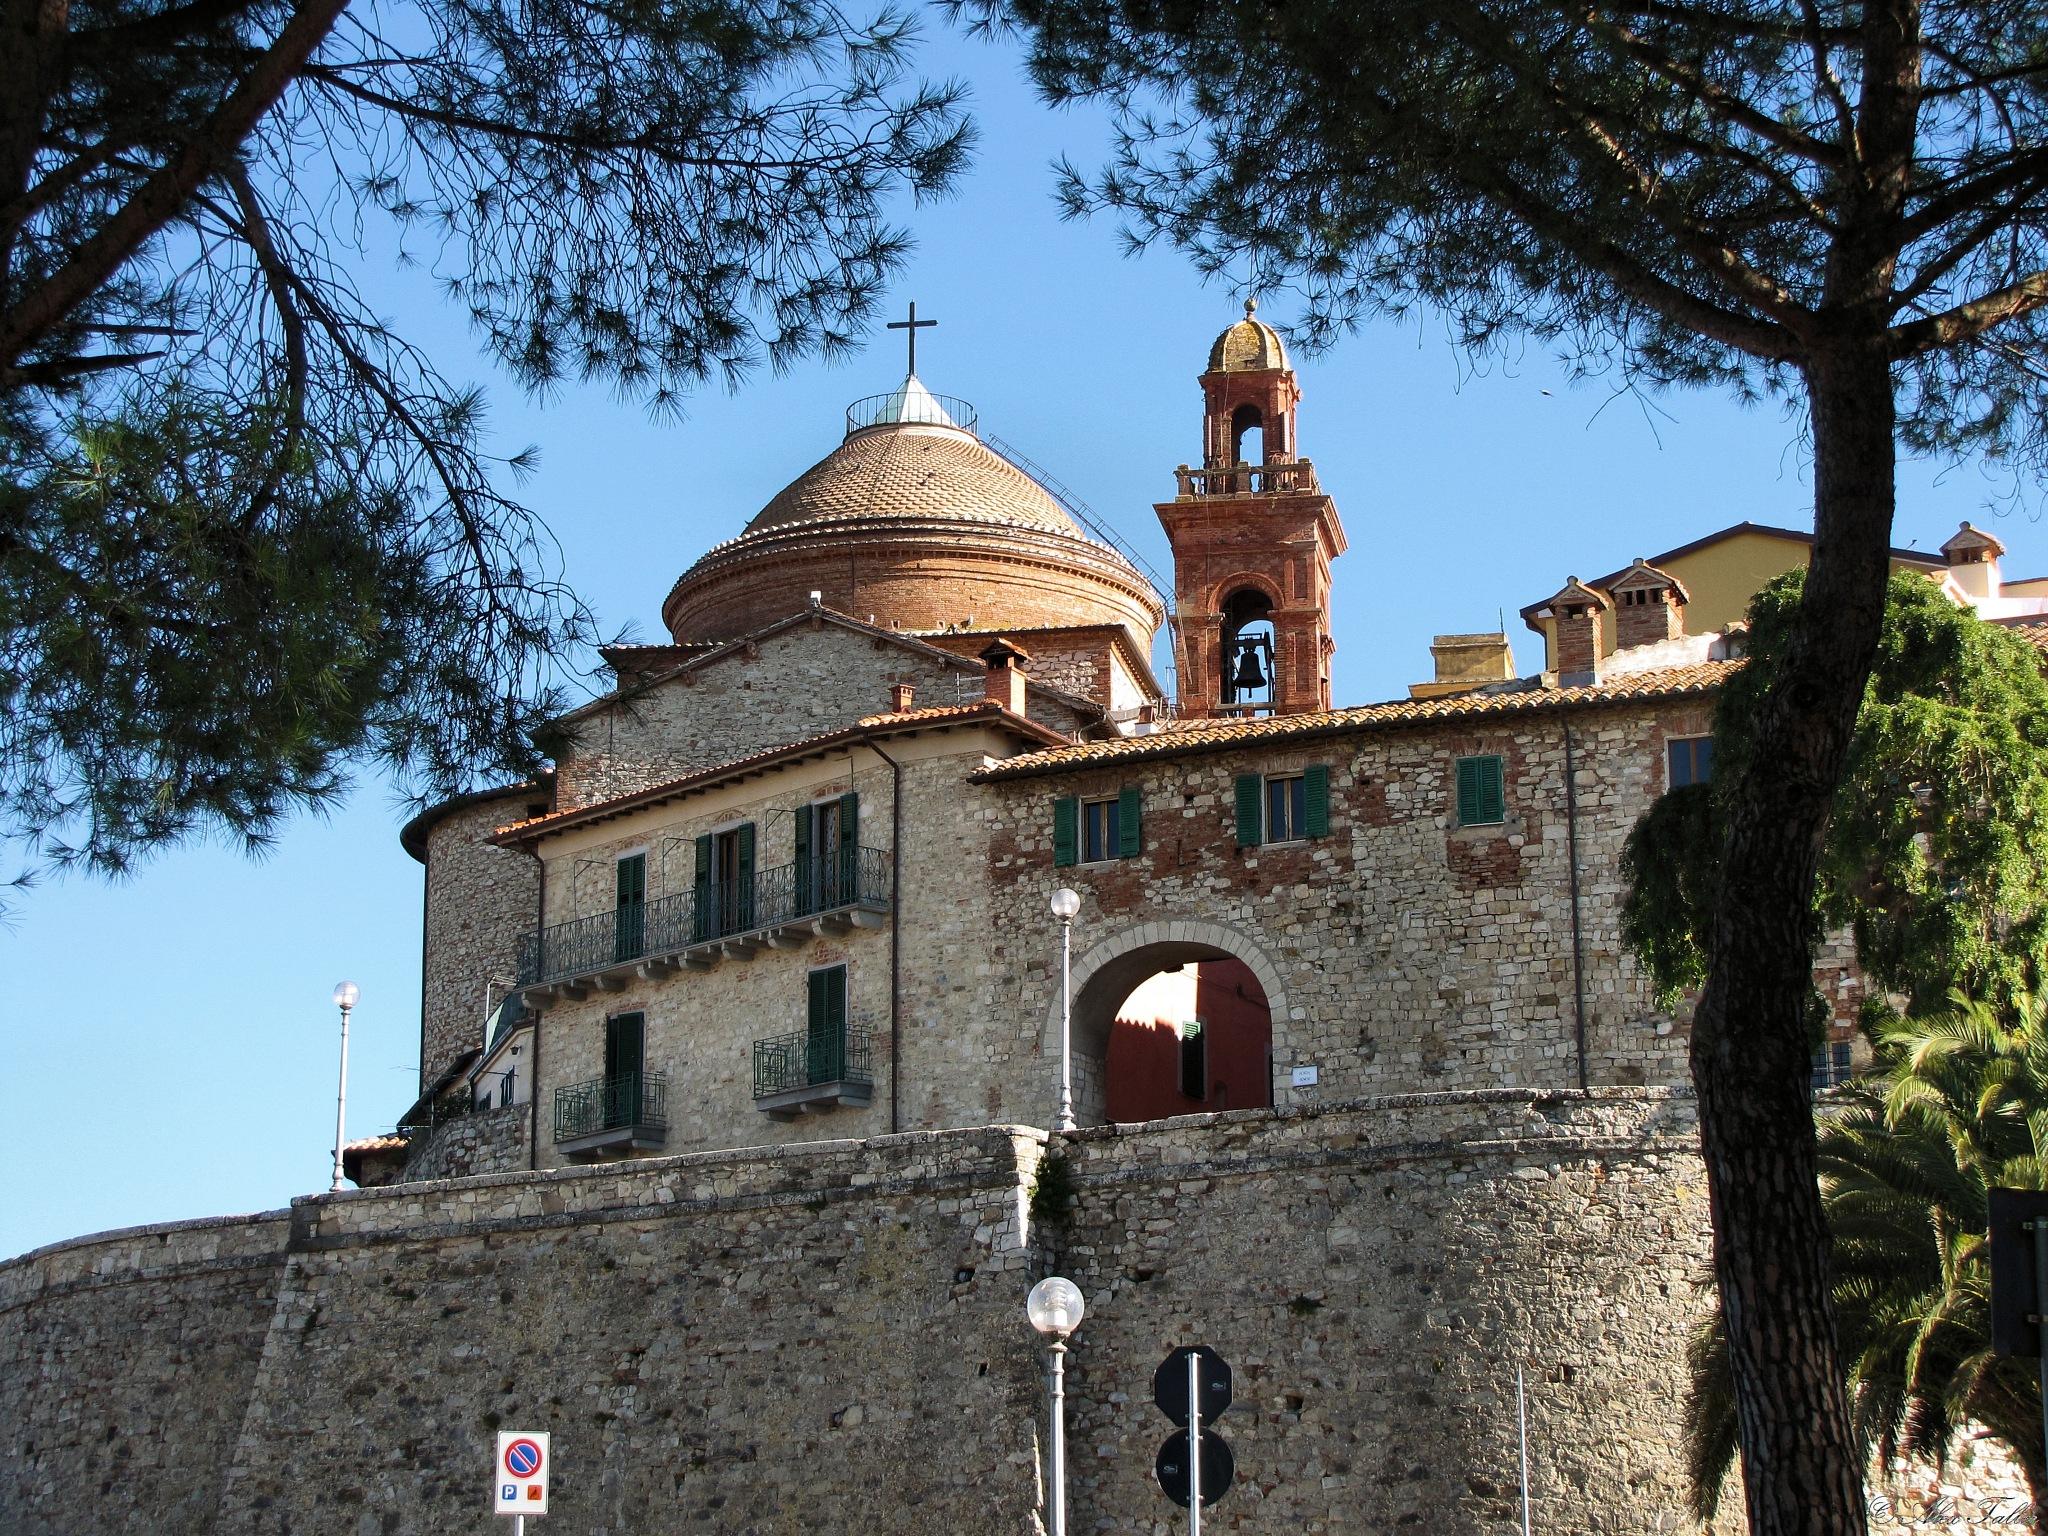 Parrocchia Santa Maria Maddalena by +Alex Taller